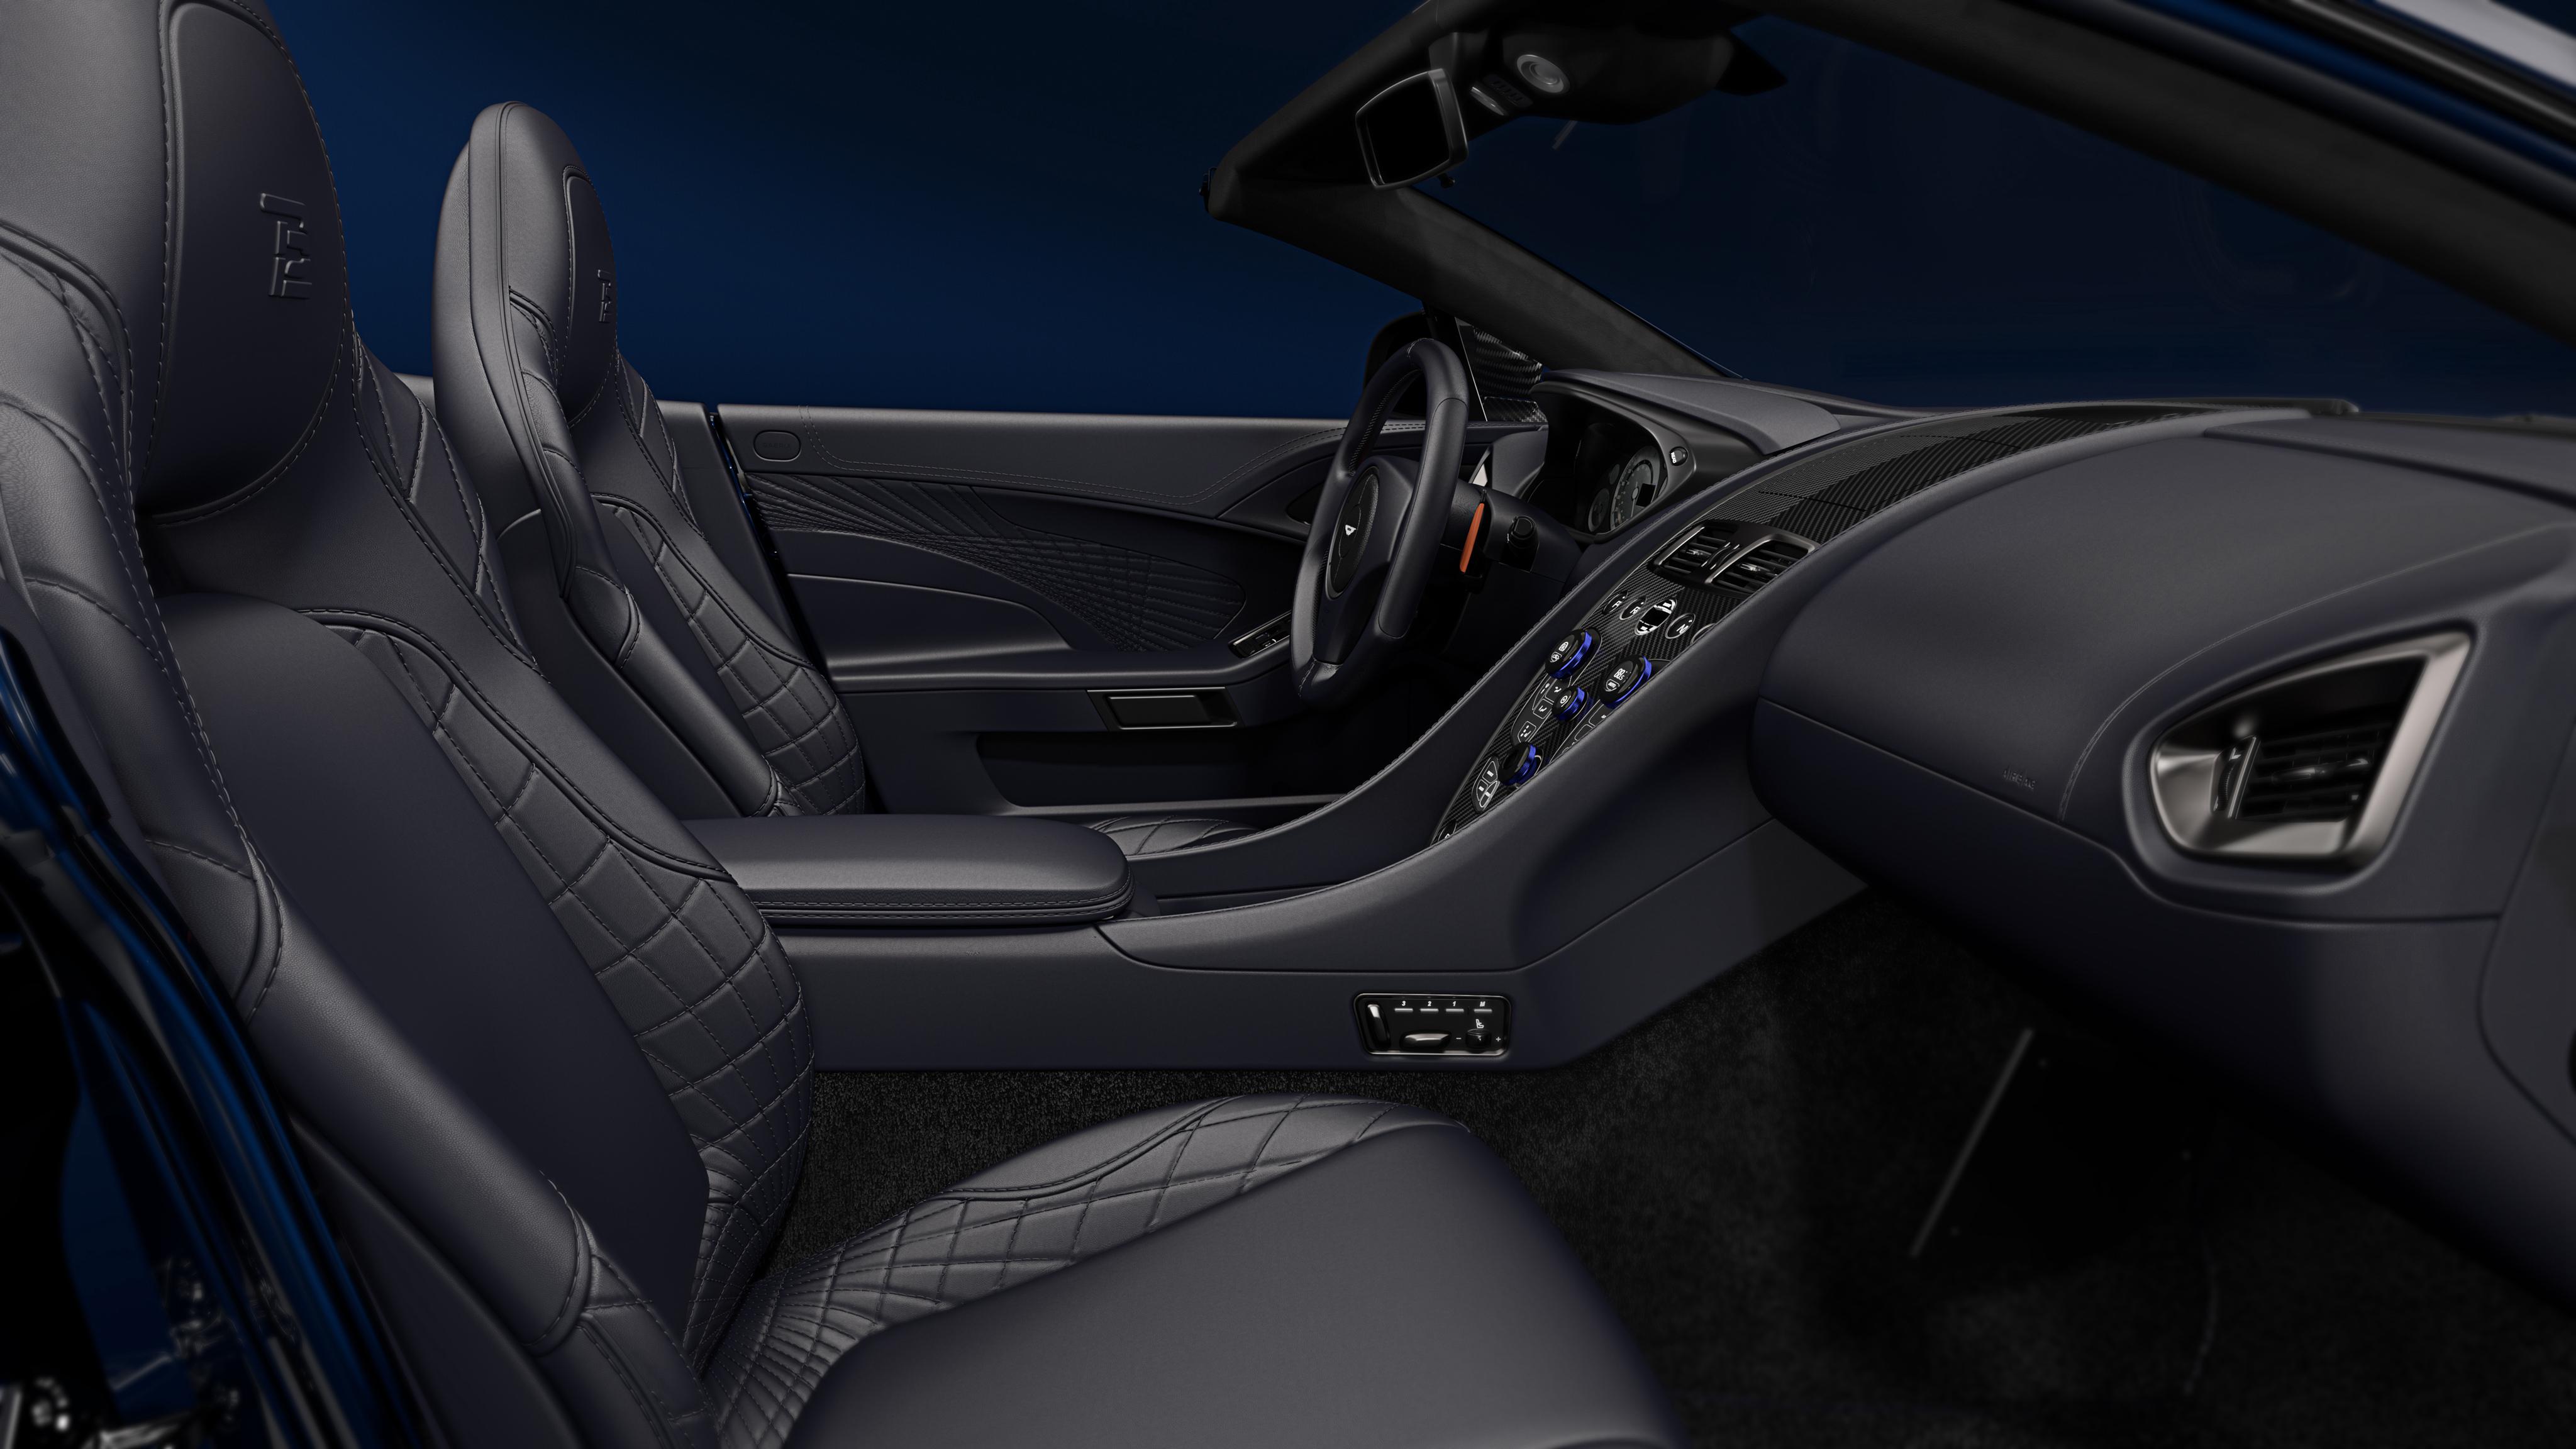 2018 aston martin vanquish s volante tom brady signature edition interior 4k wallpaper hd car. Black Bedroom Furniture Sets. Home Design Ideas